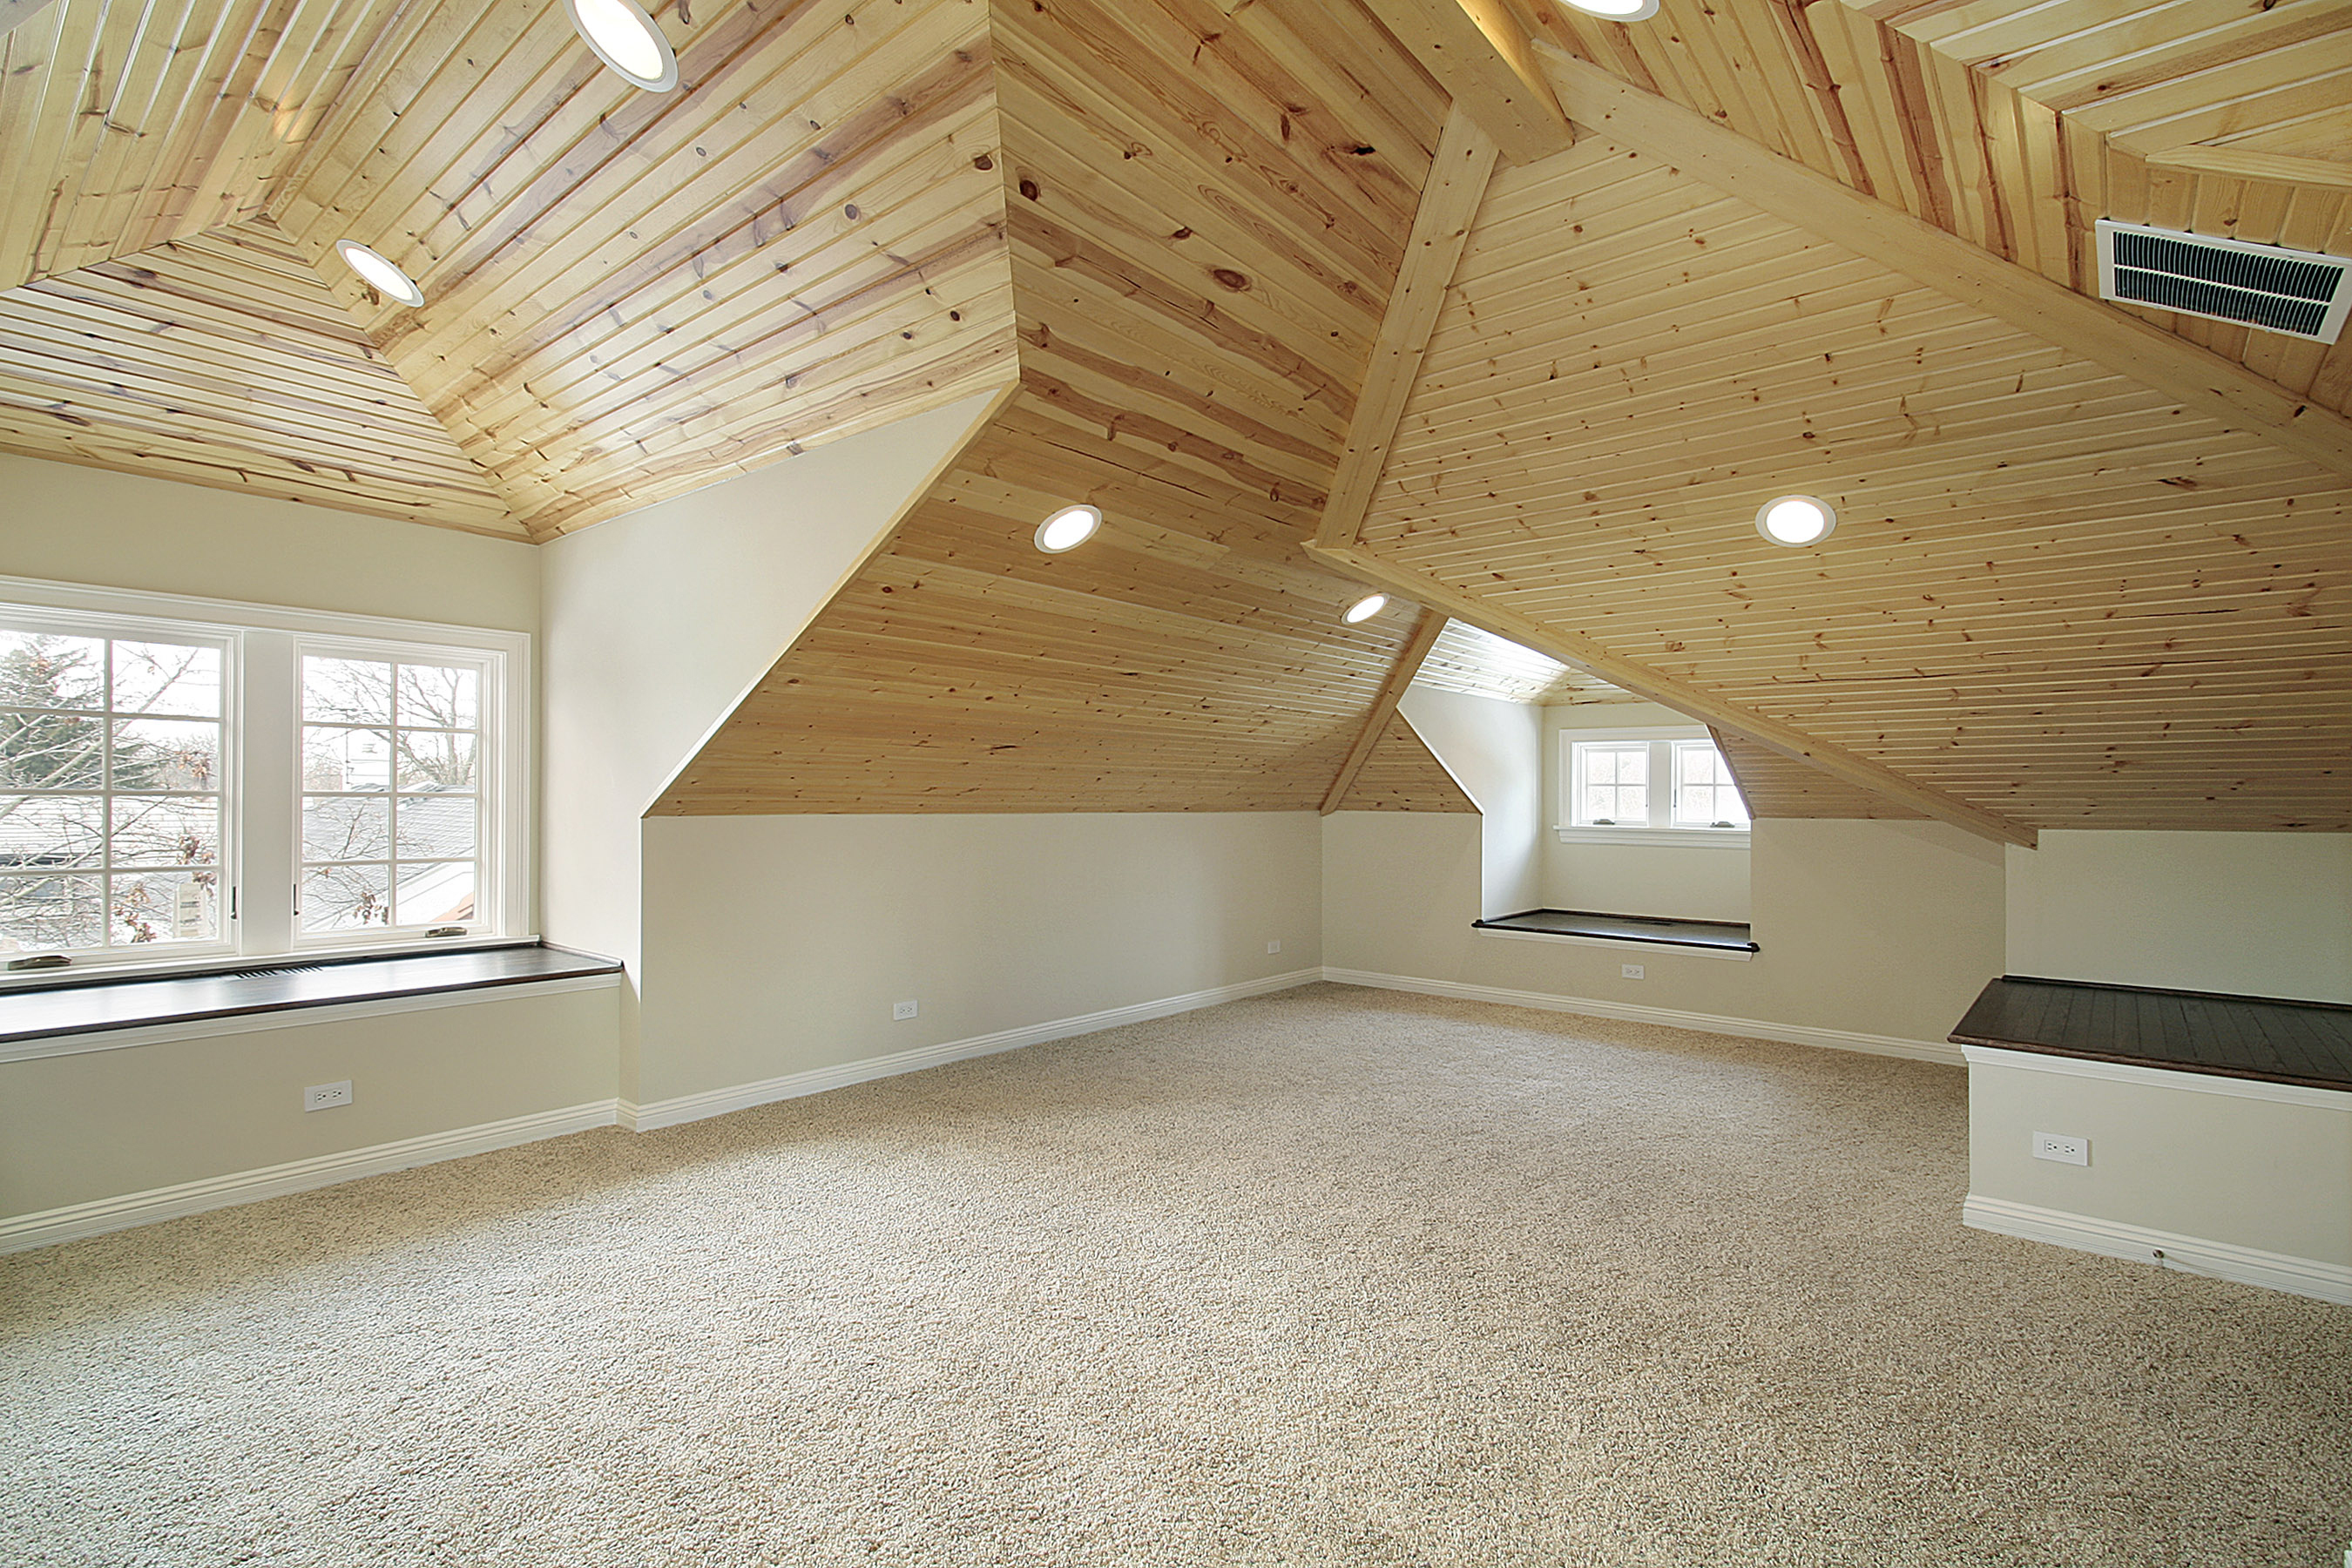 bigstock-Loft-In-New-Construction-Home-5059095